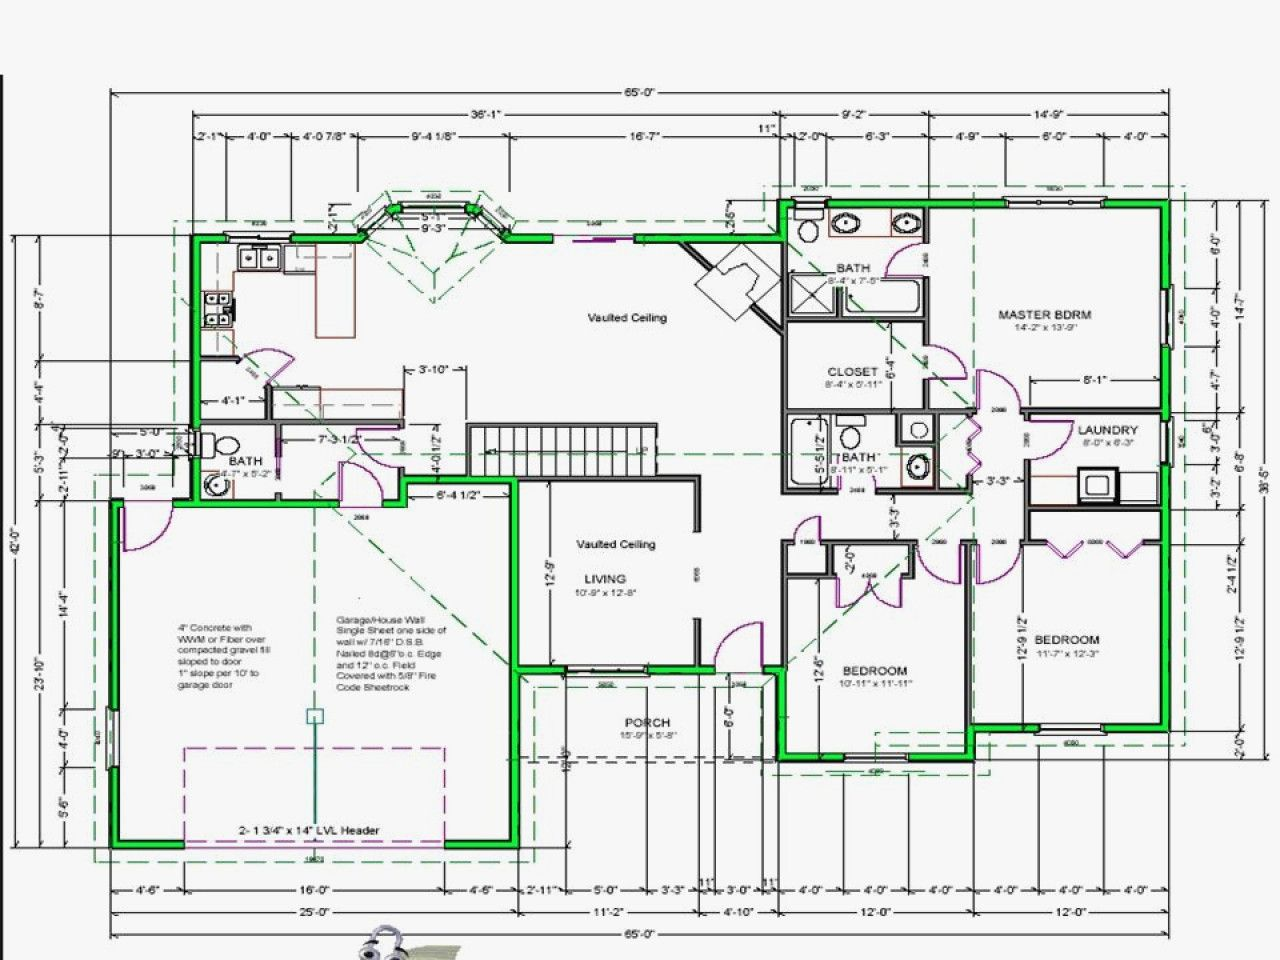 House  Plan  Drawing  software  Free  Download  Elegant Best